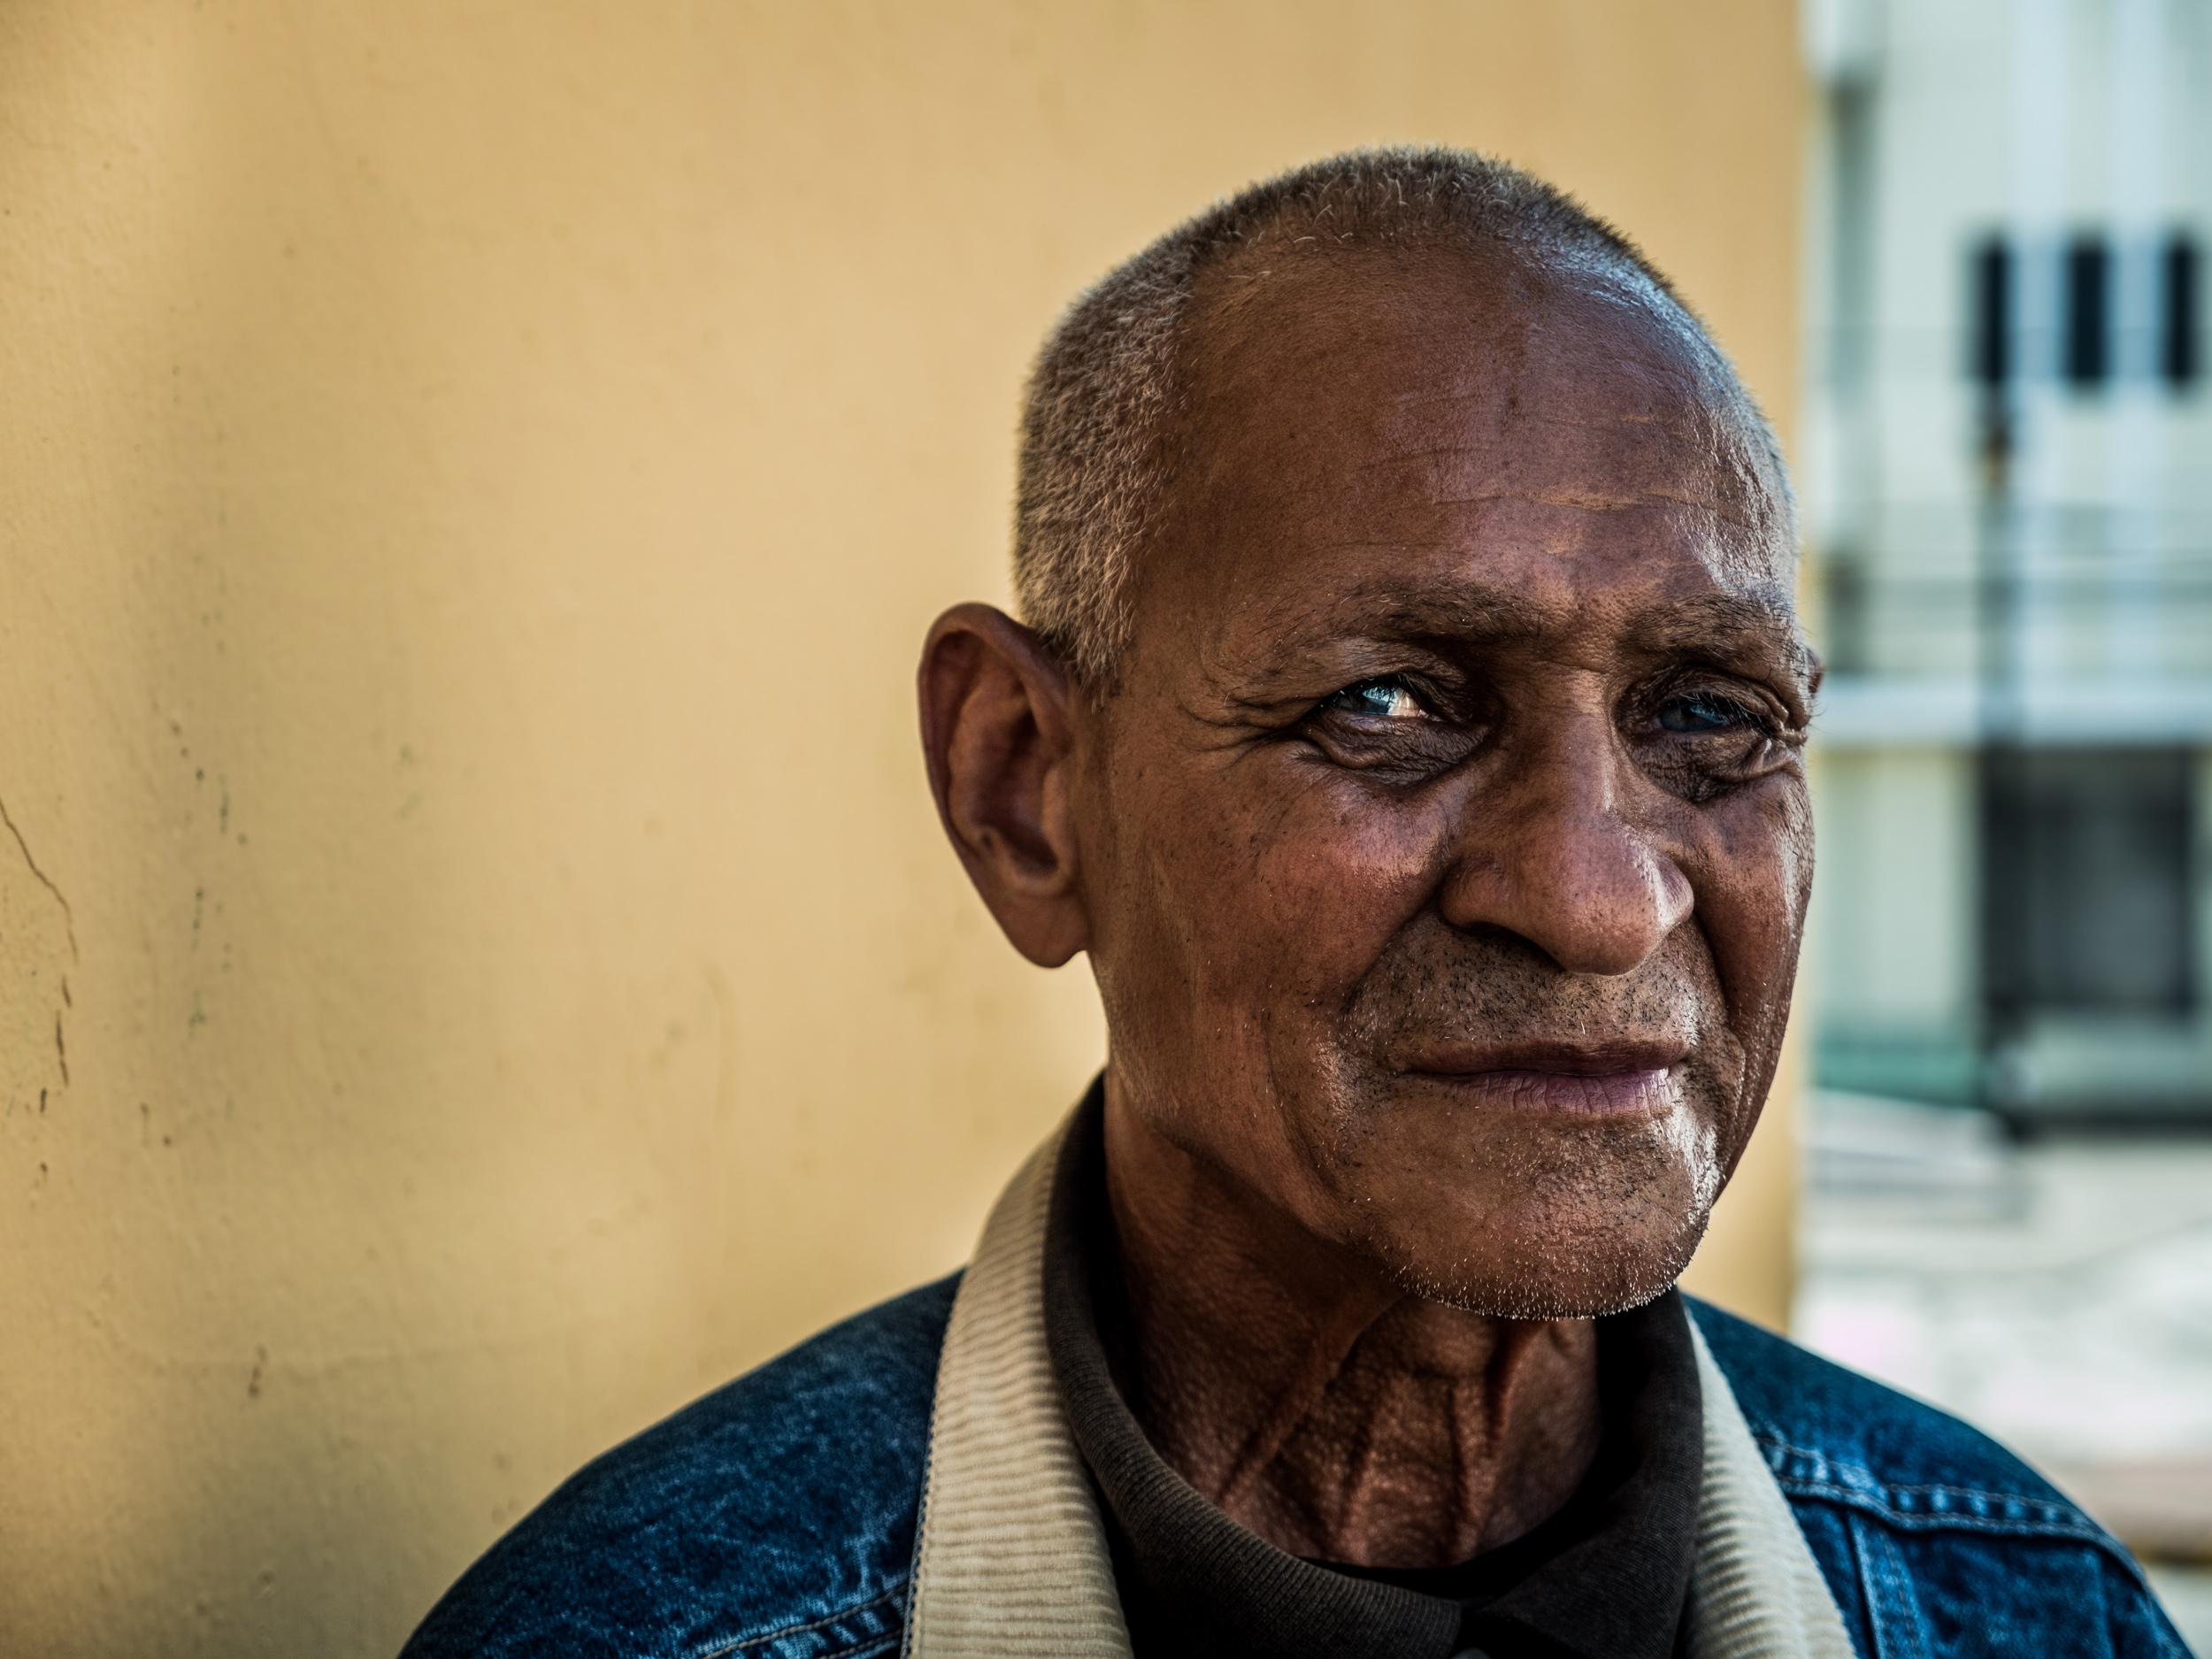 _24 Elderly man dark skin and blue eyes.jpg